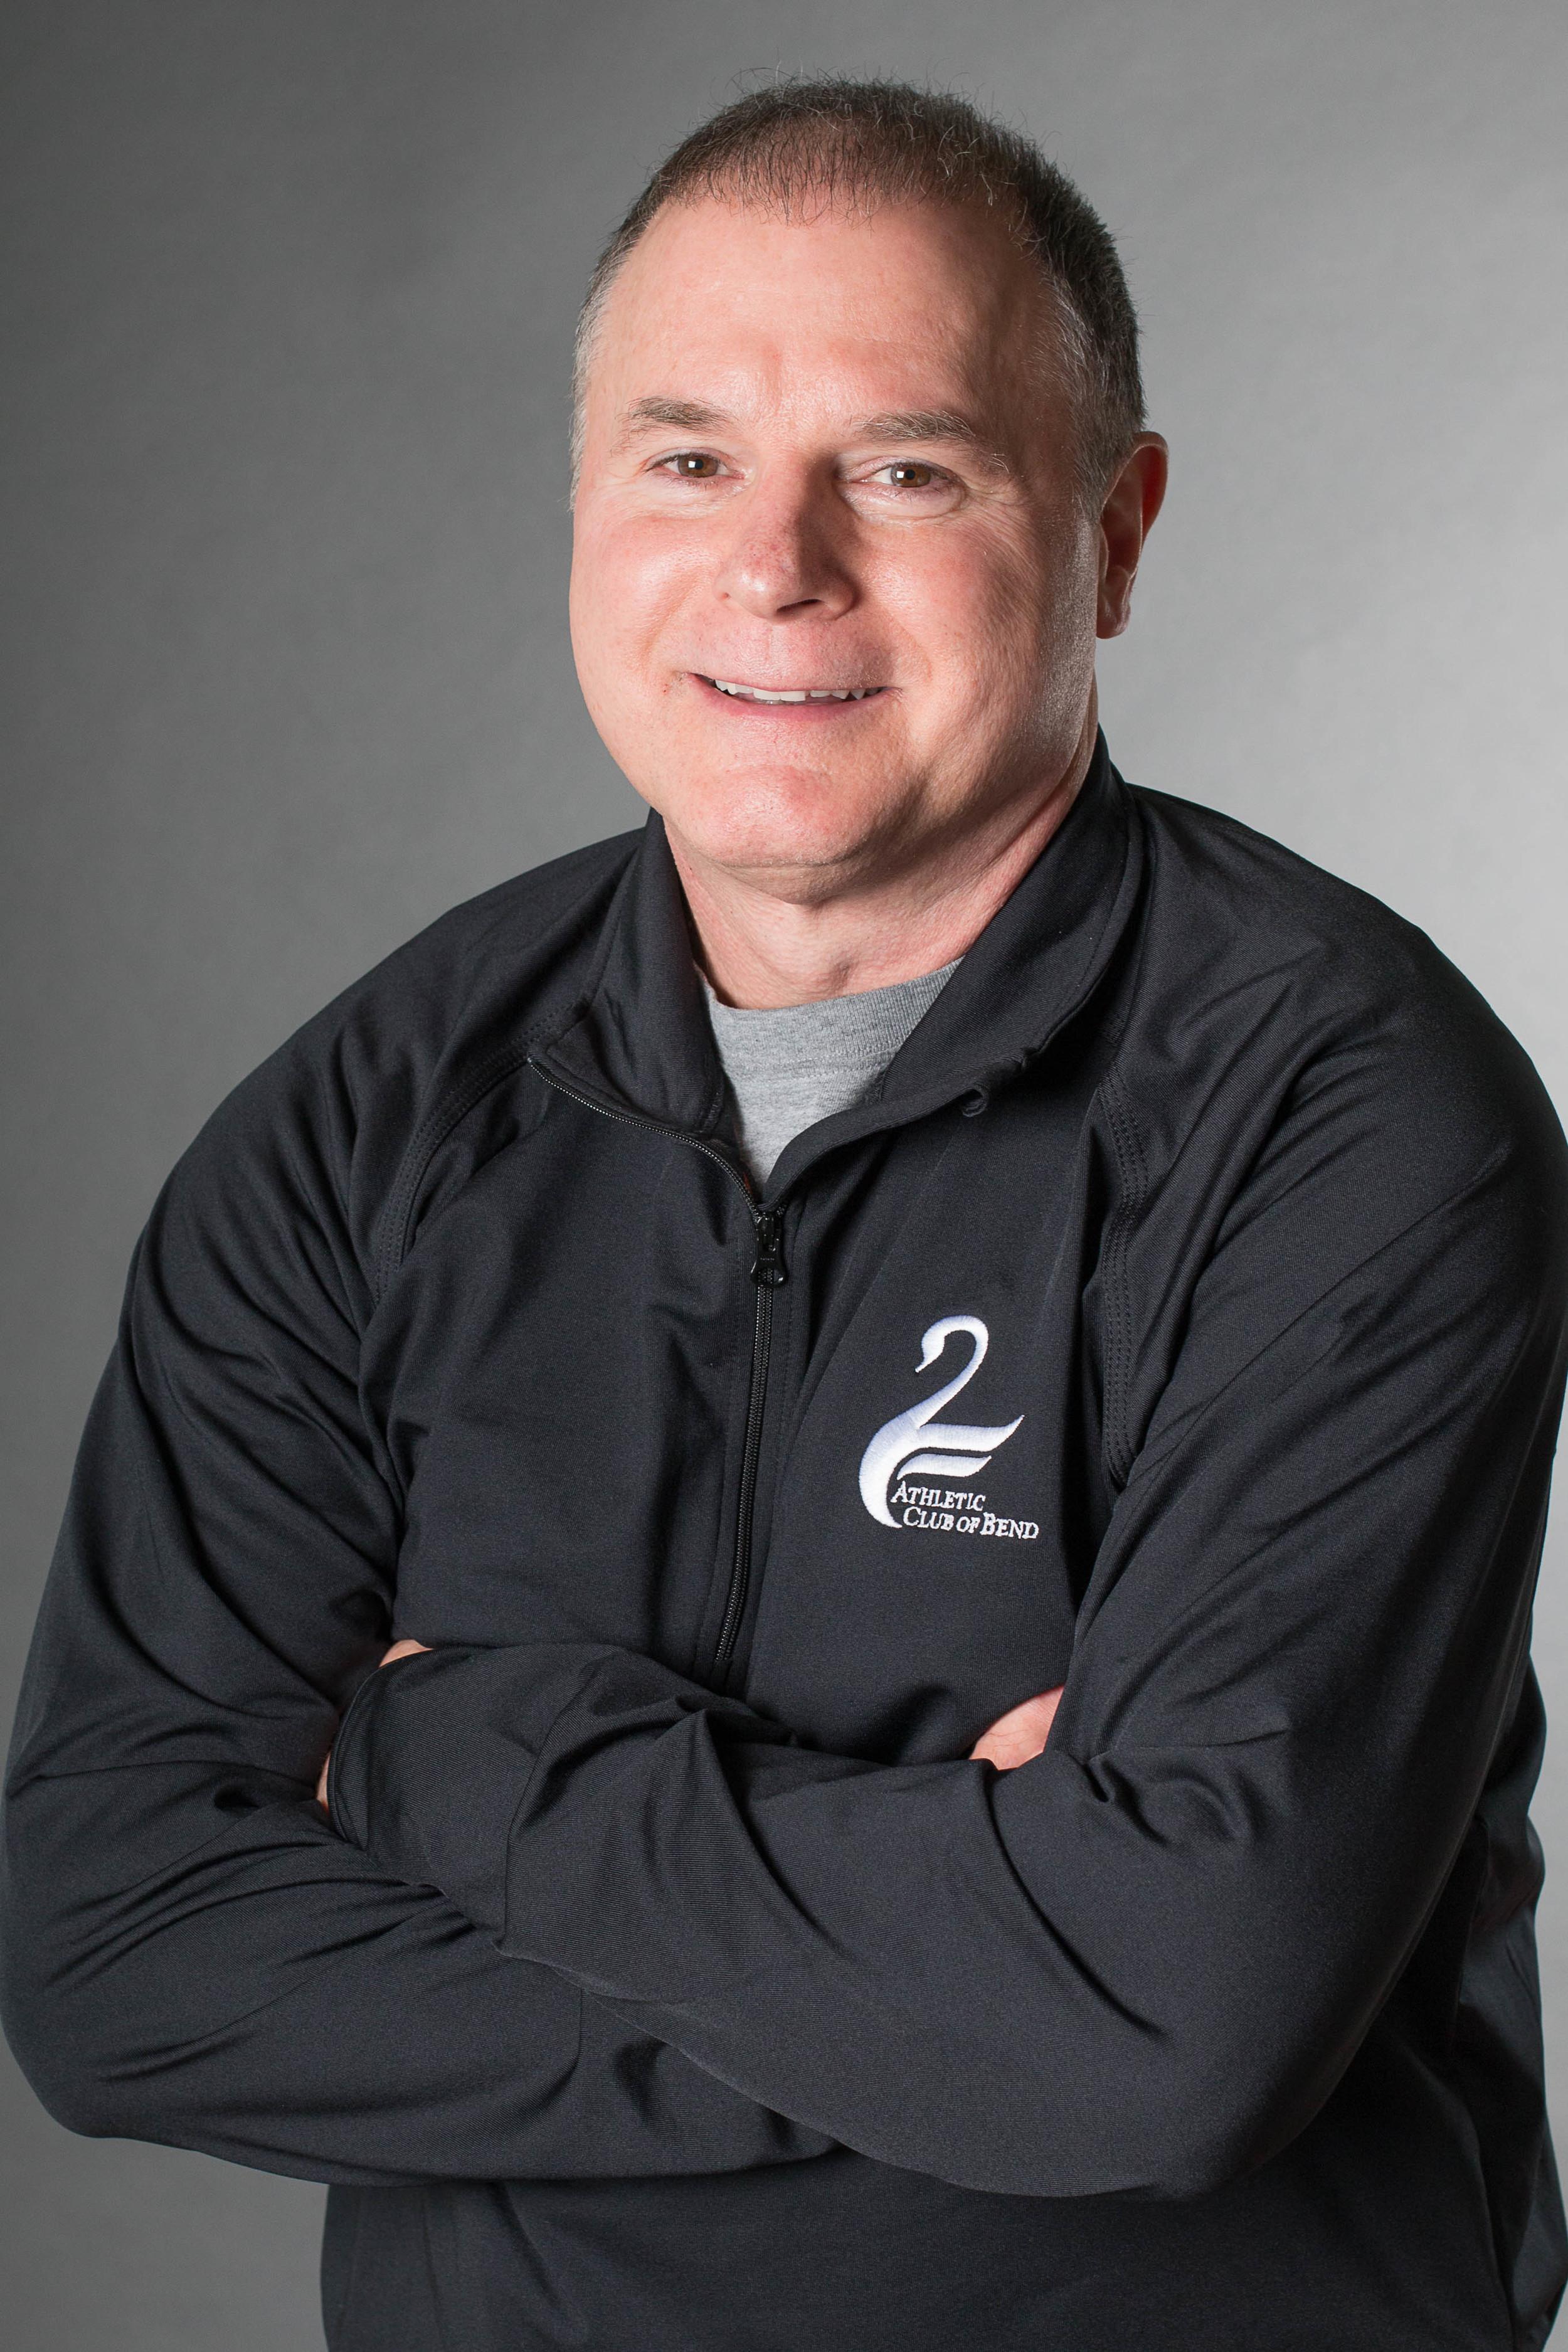 Tim Mullane, Head Tennis Pro